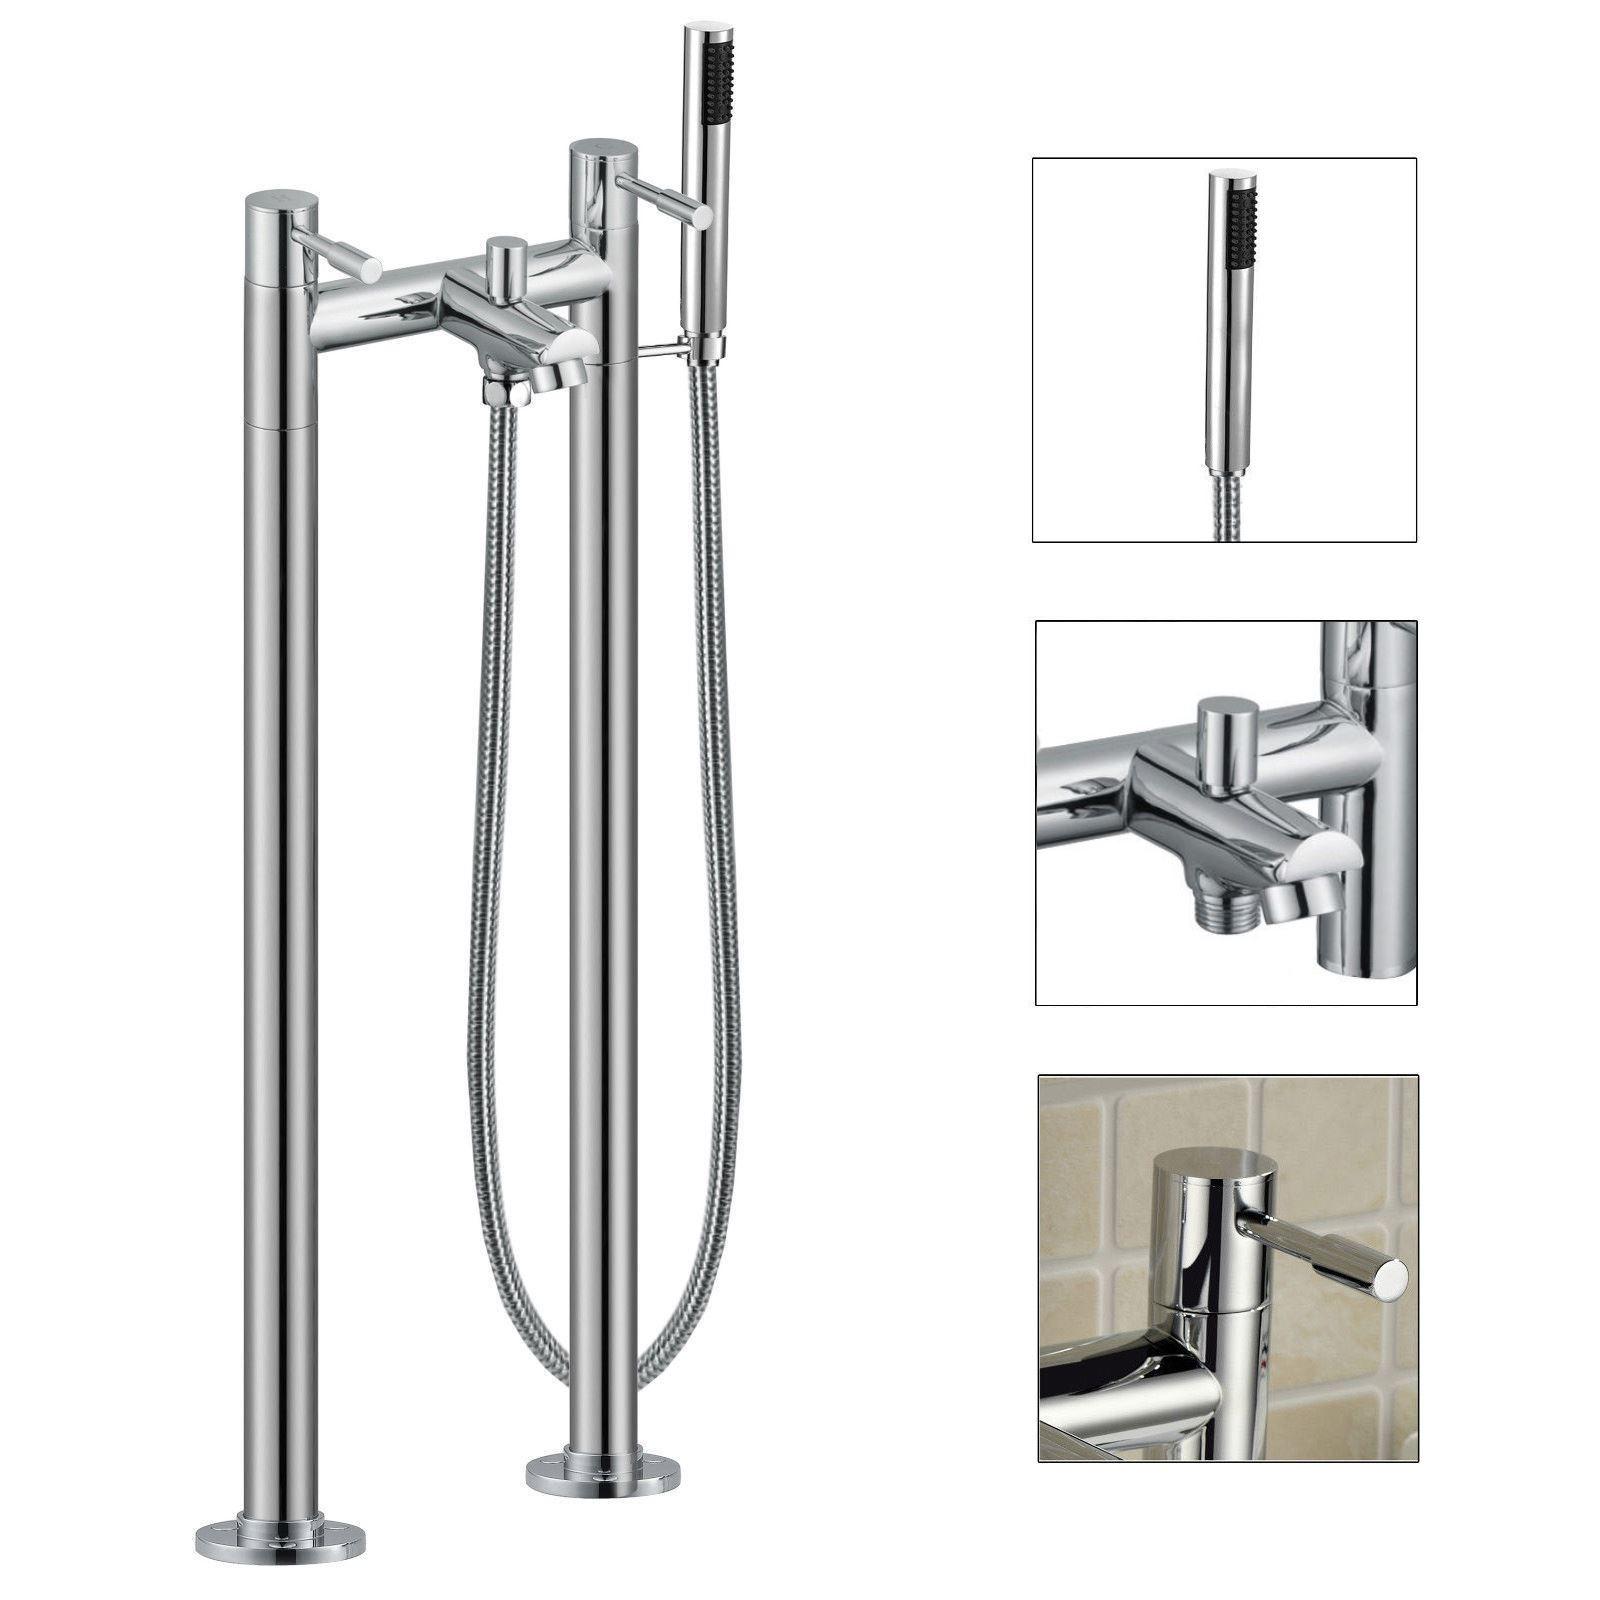 TRADITIONAL FREESTANDING BATH SHOWER MIXER PIPE LEGS CHROME BATHROOM BRASS TAP